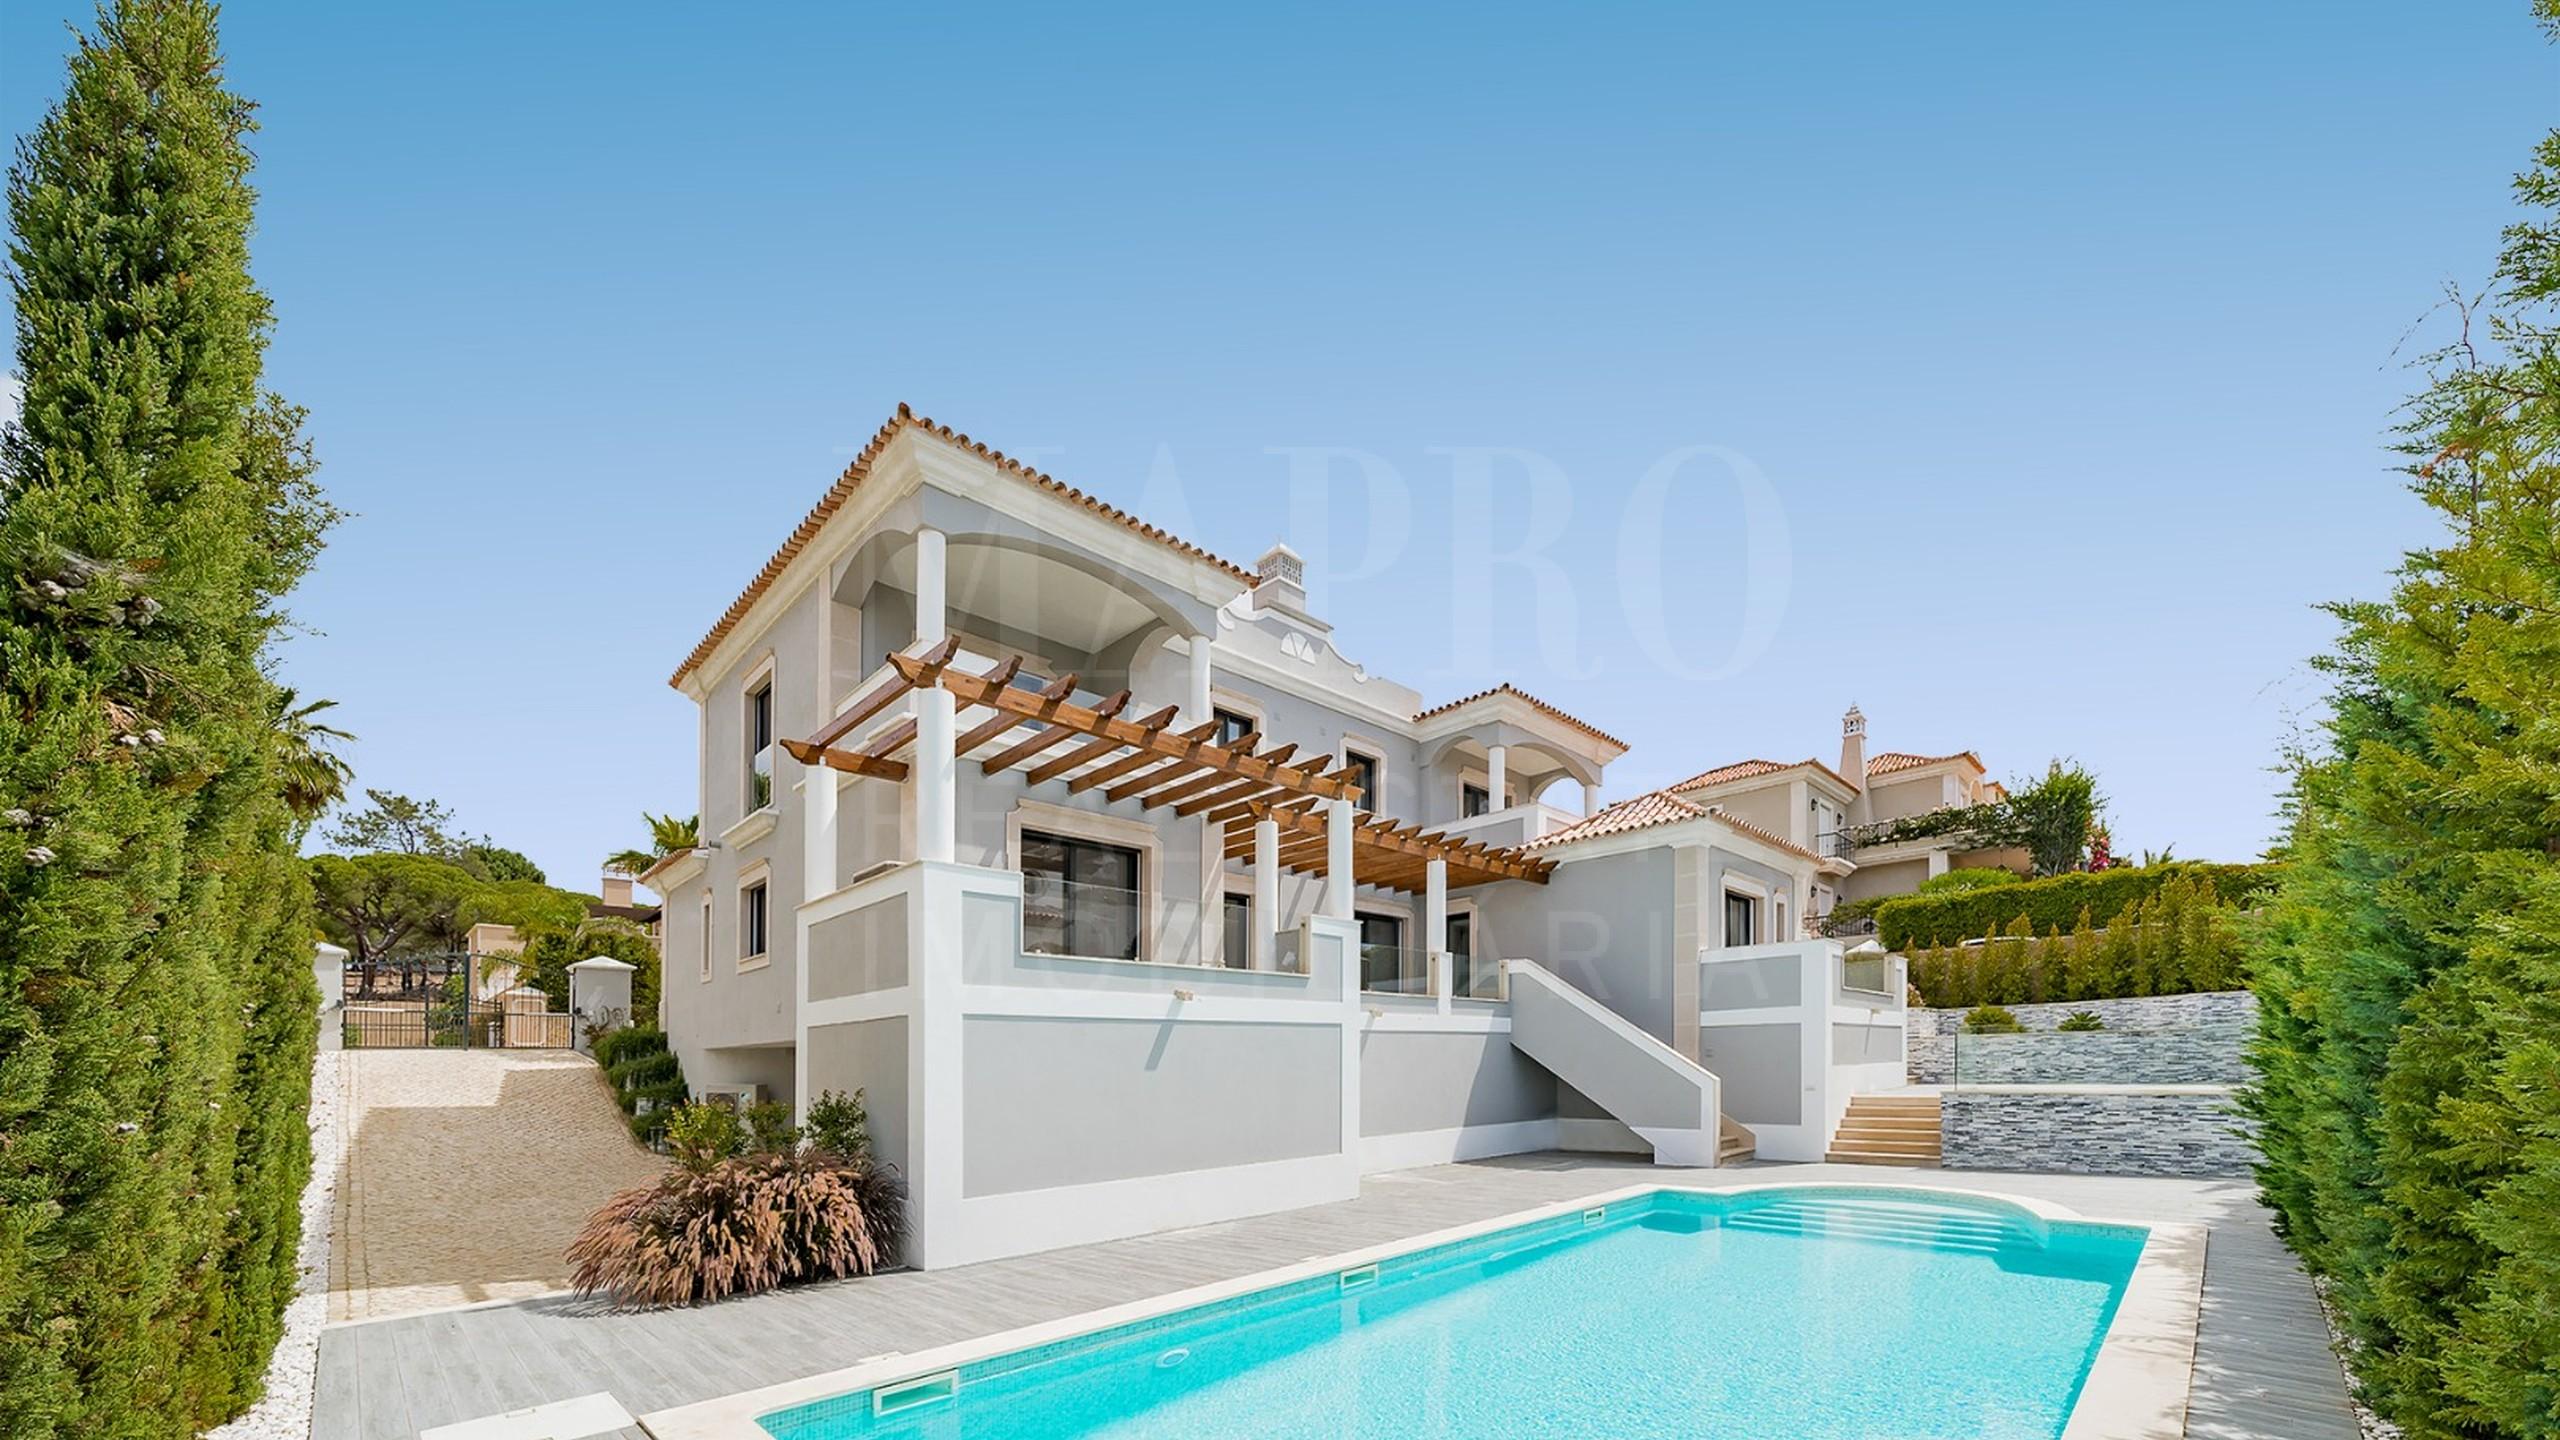 Villa estilo clássico 4 quartos - Quinta do Mar